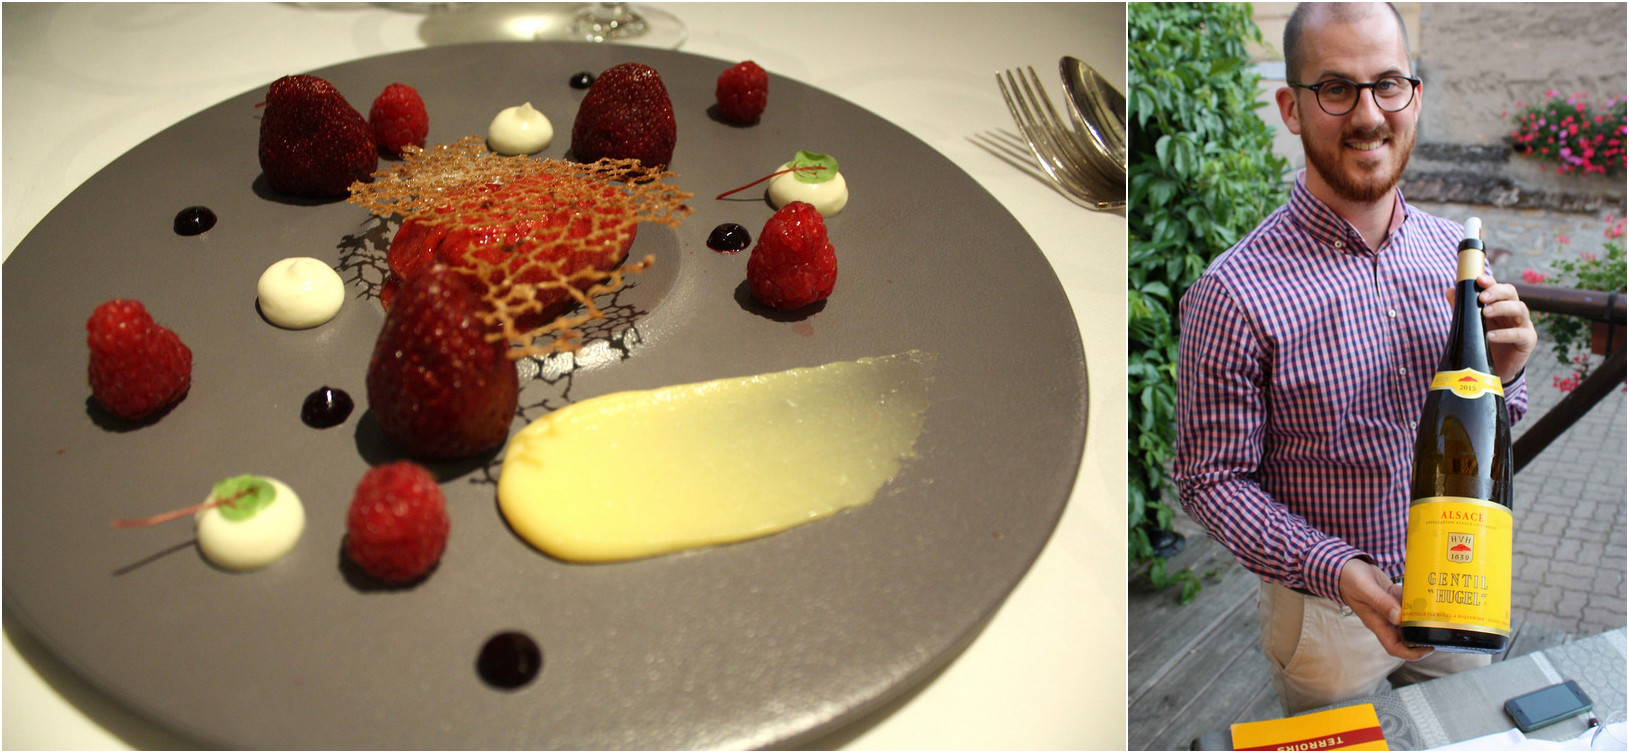 Duo framboise_fraise © Gourmets&Co - copie